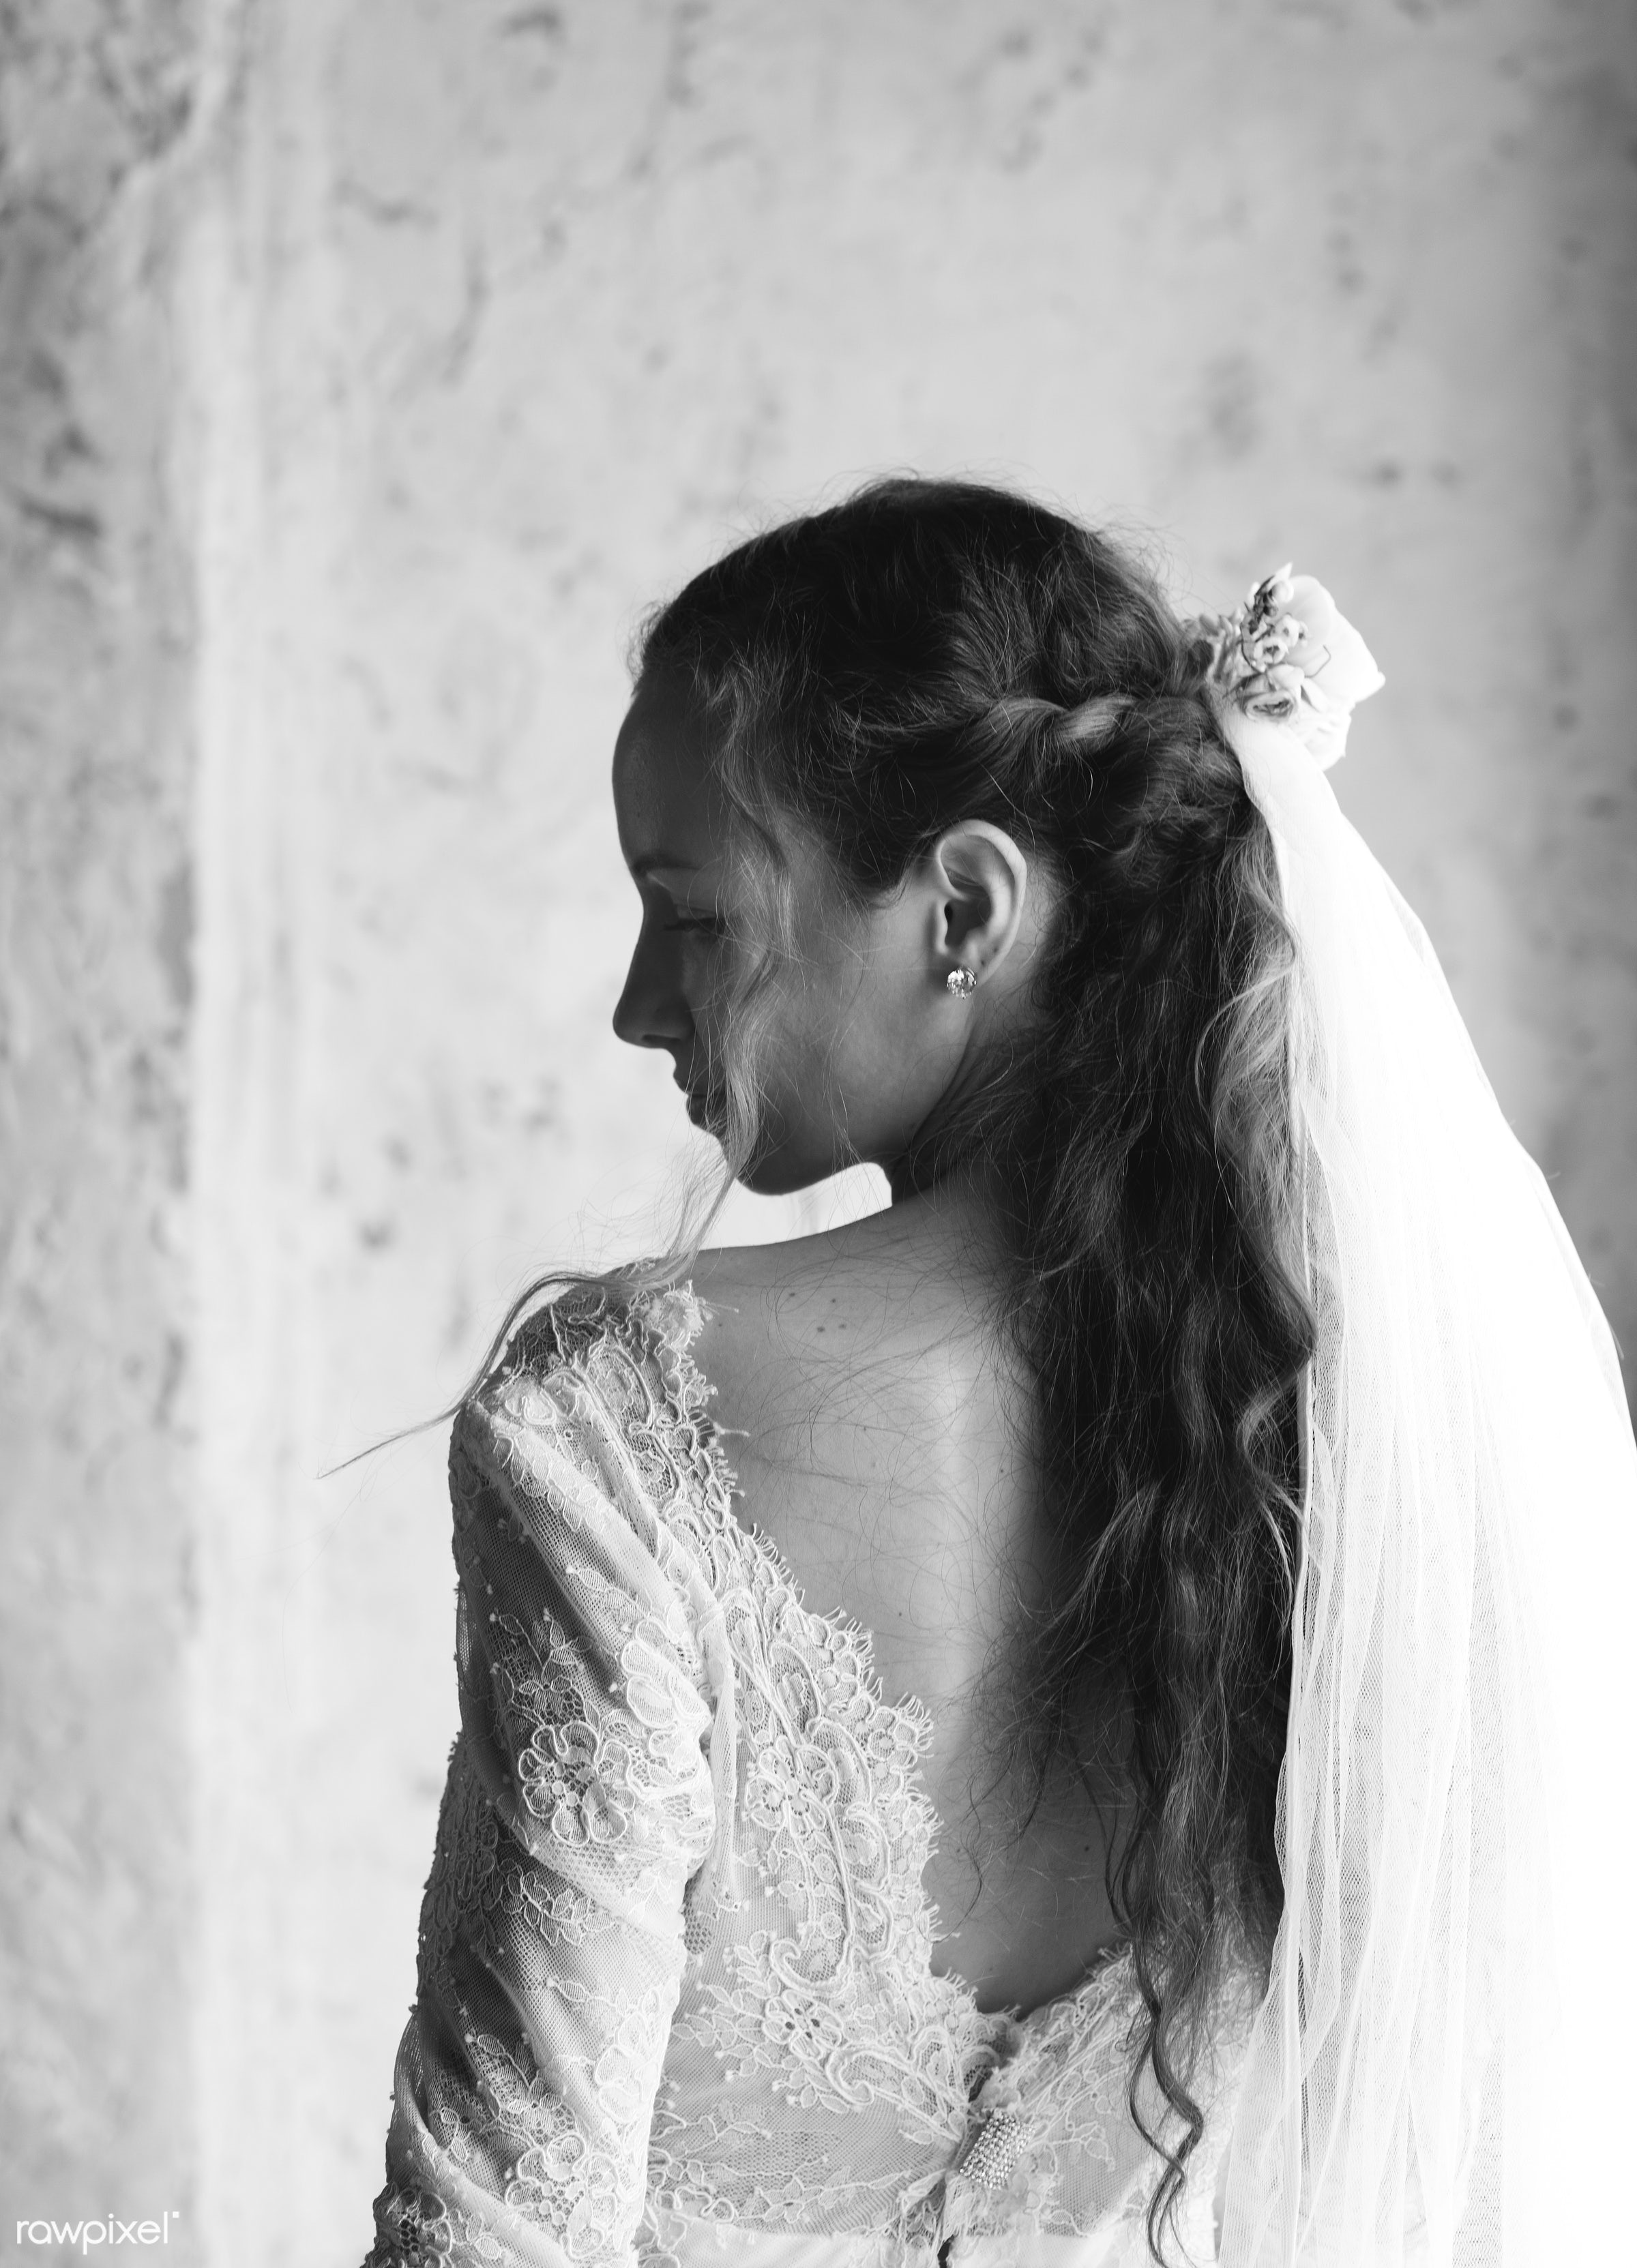 Attractive Beautiful Bride in a Wedding White Dress - adult, attractive, beautiful, bridal, bride, celebration, ceremony,...